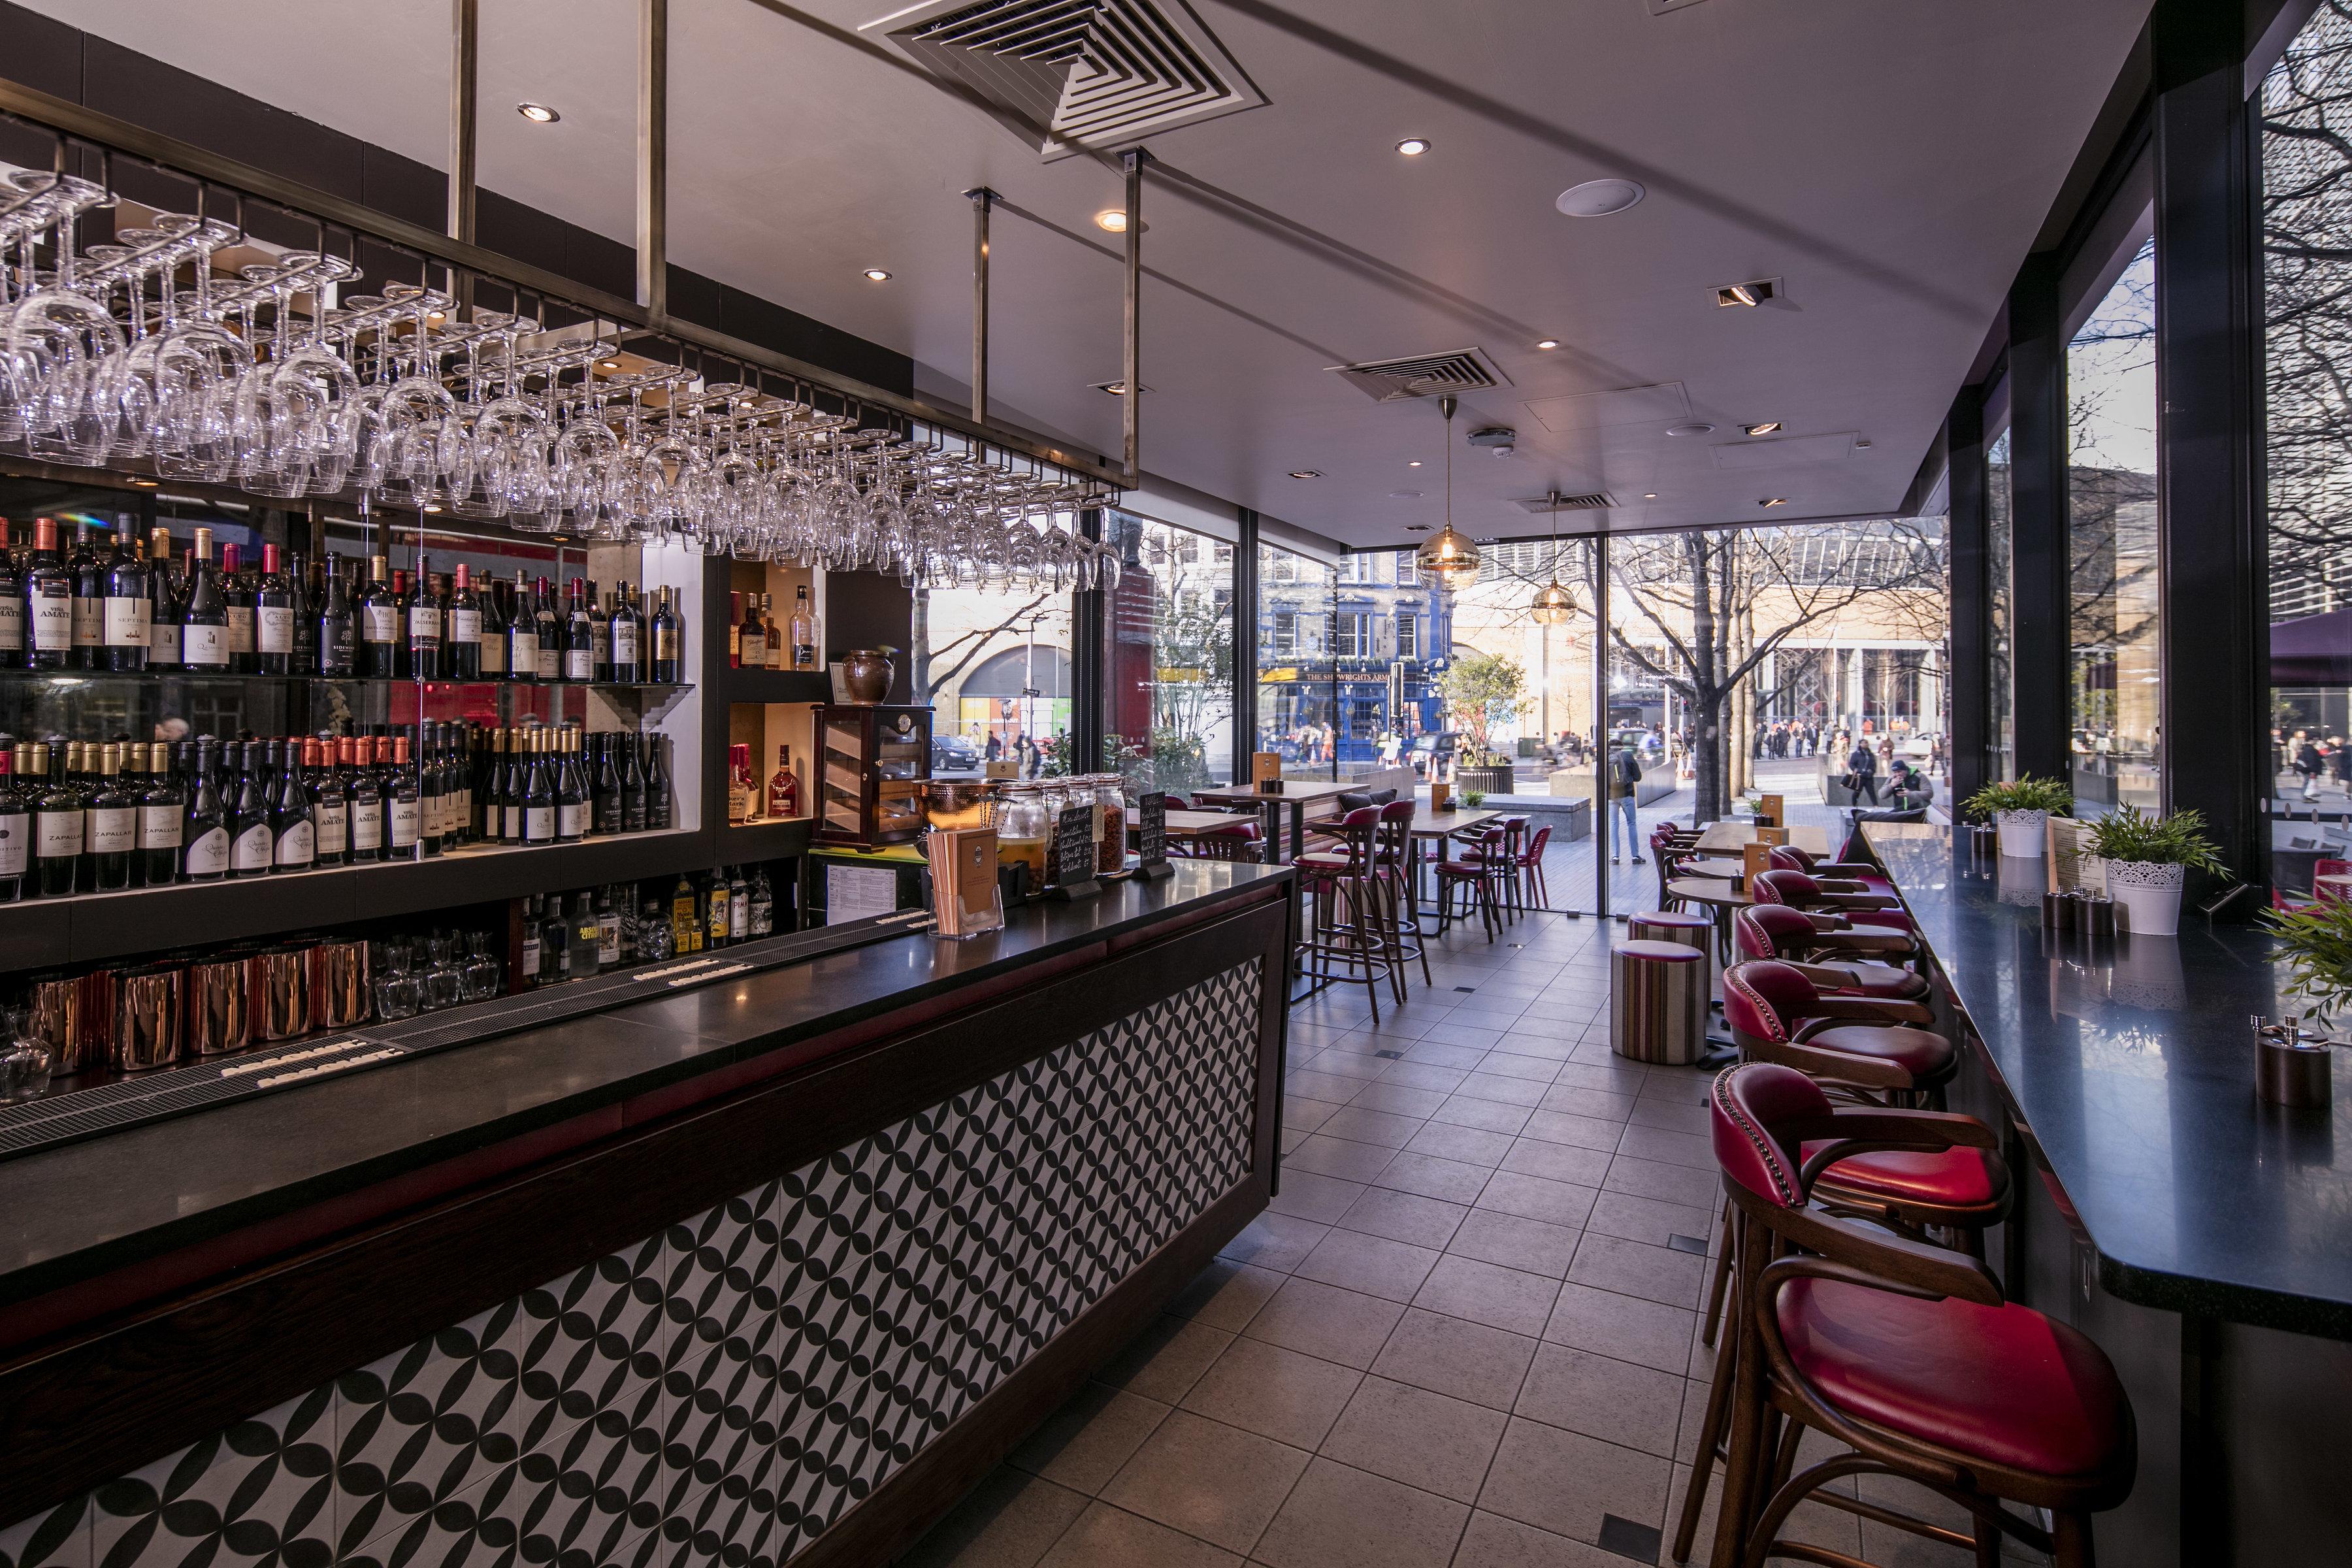 Gorgeous Guzzle 15 Of The Best Bars In London Bridge Designmynight